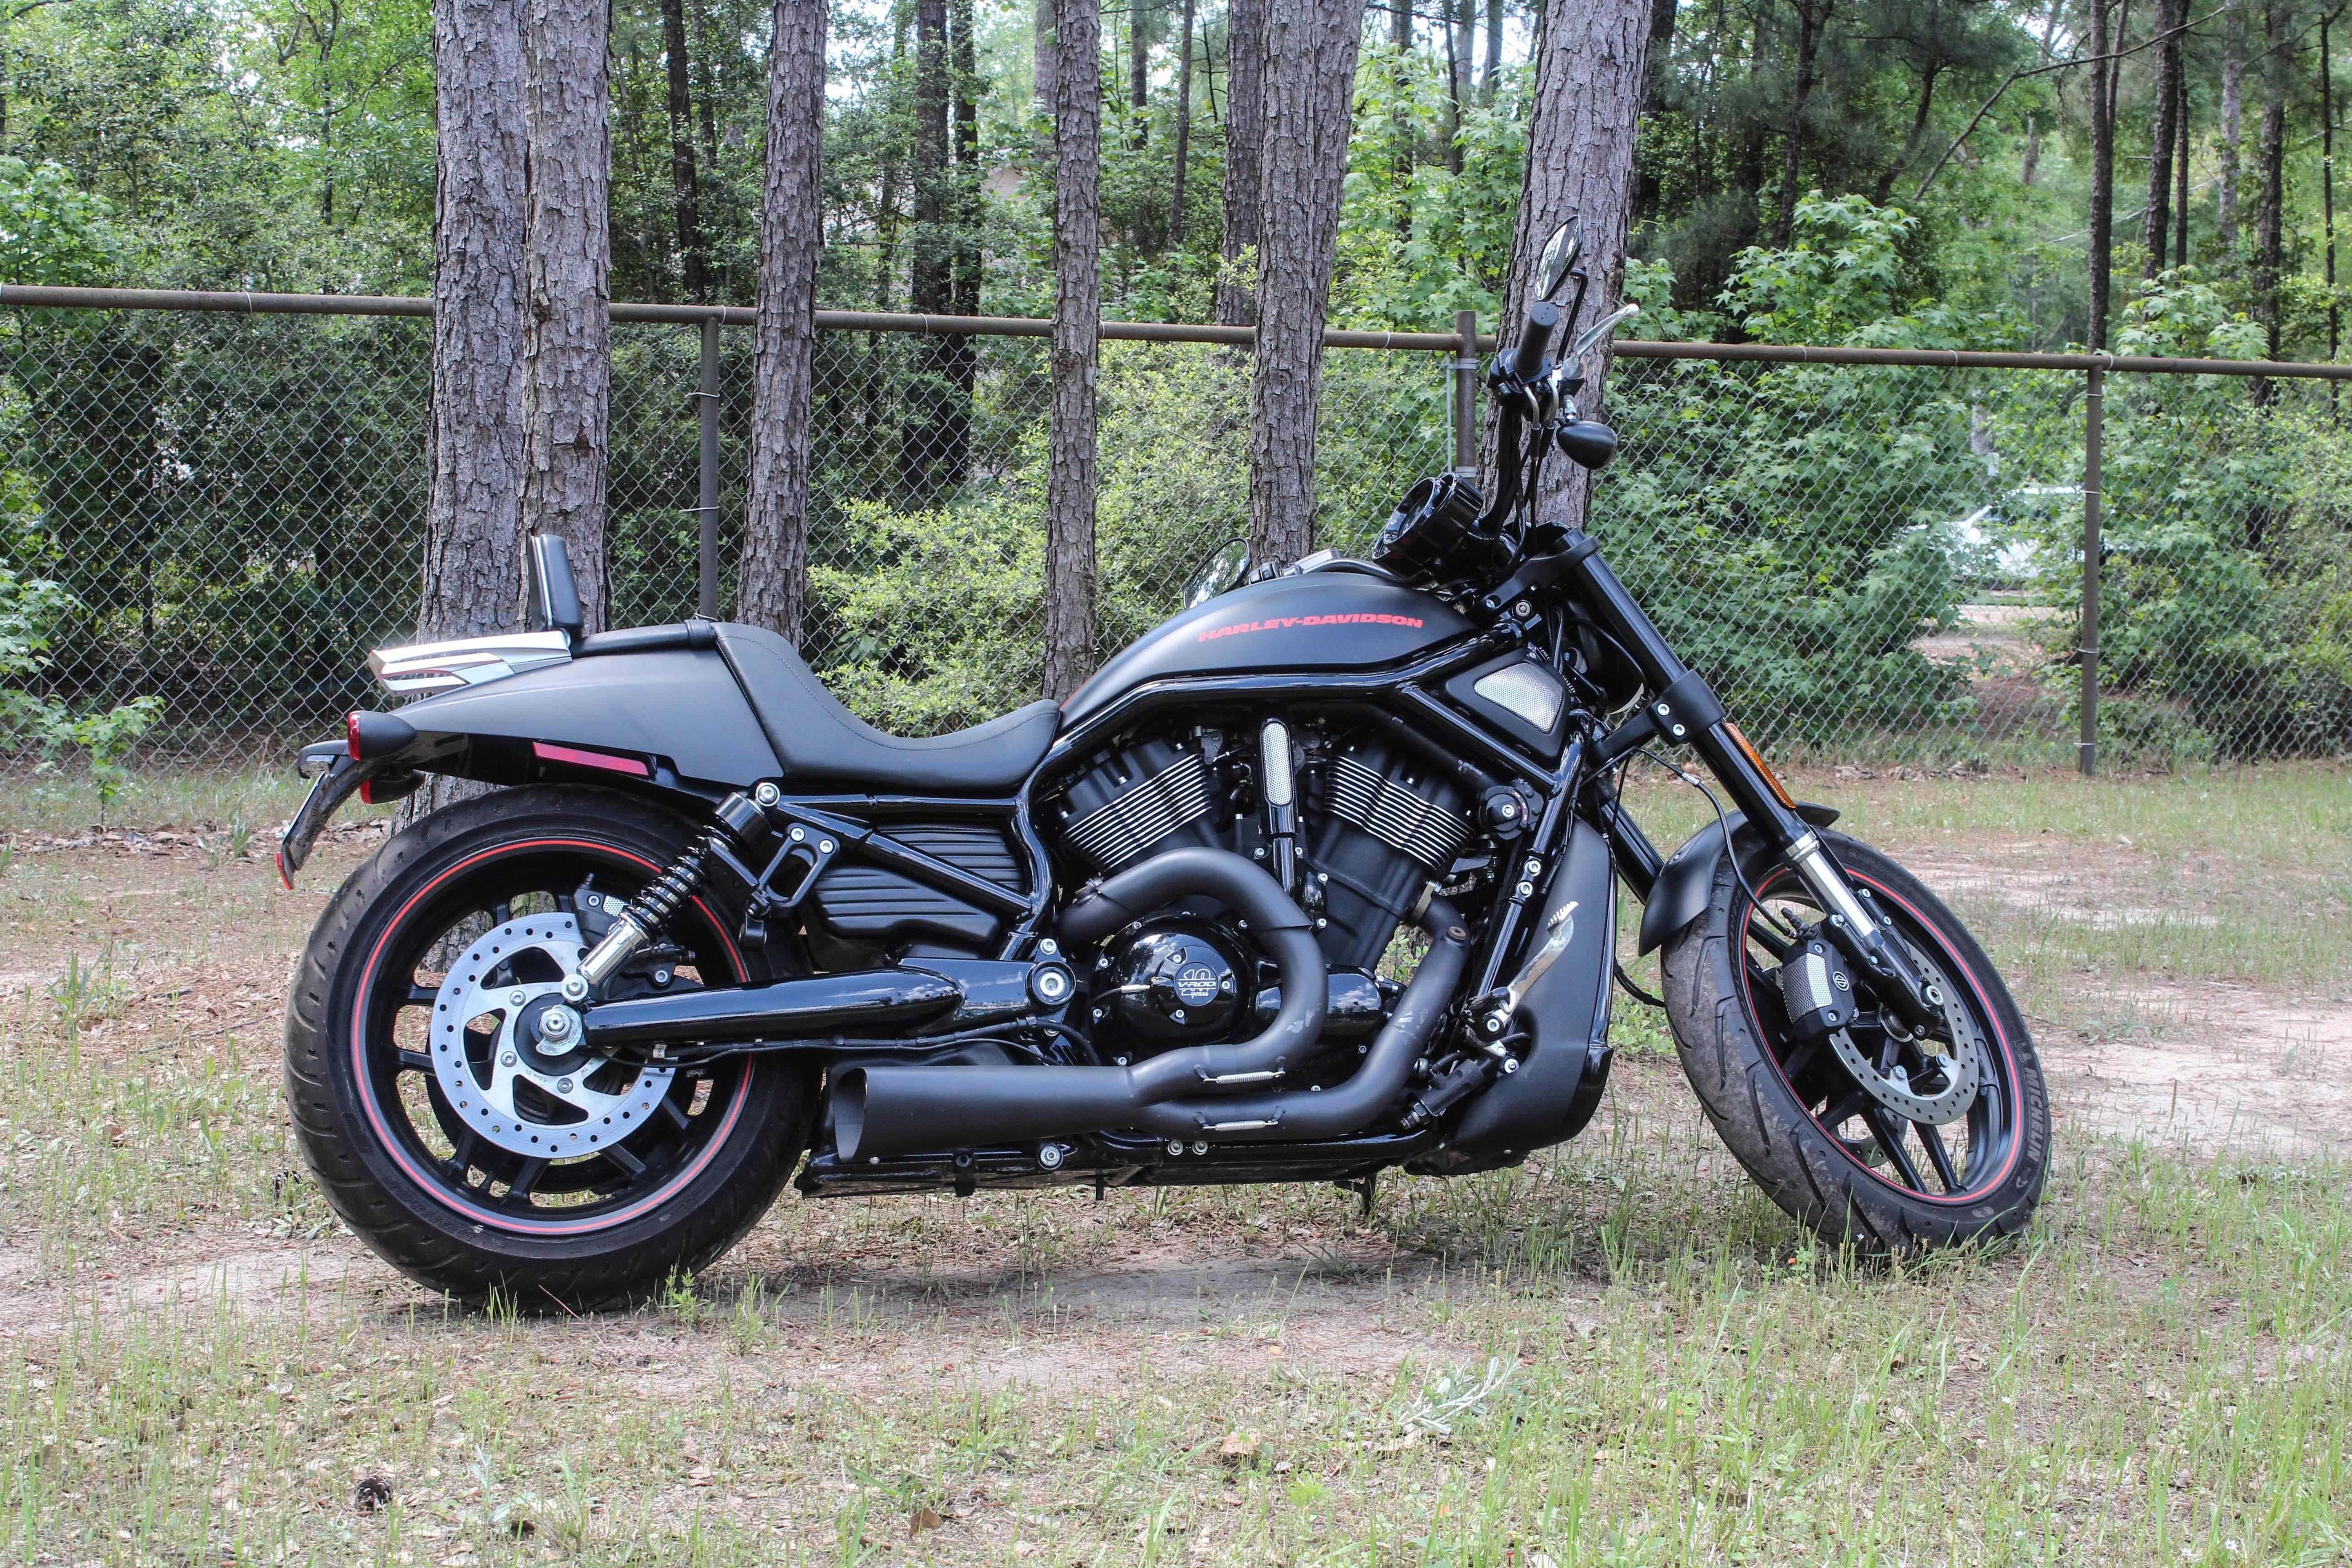 Buy 2012 Harley Davidson Vrscdx Night Rod Special: 2012 Harley-Davidson® VRSCDX V-Rod® Night Rod® Special